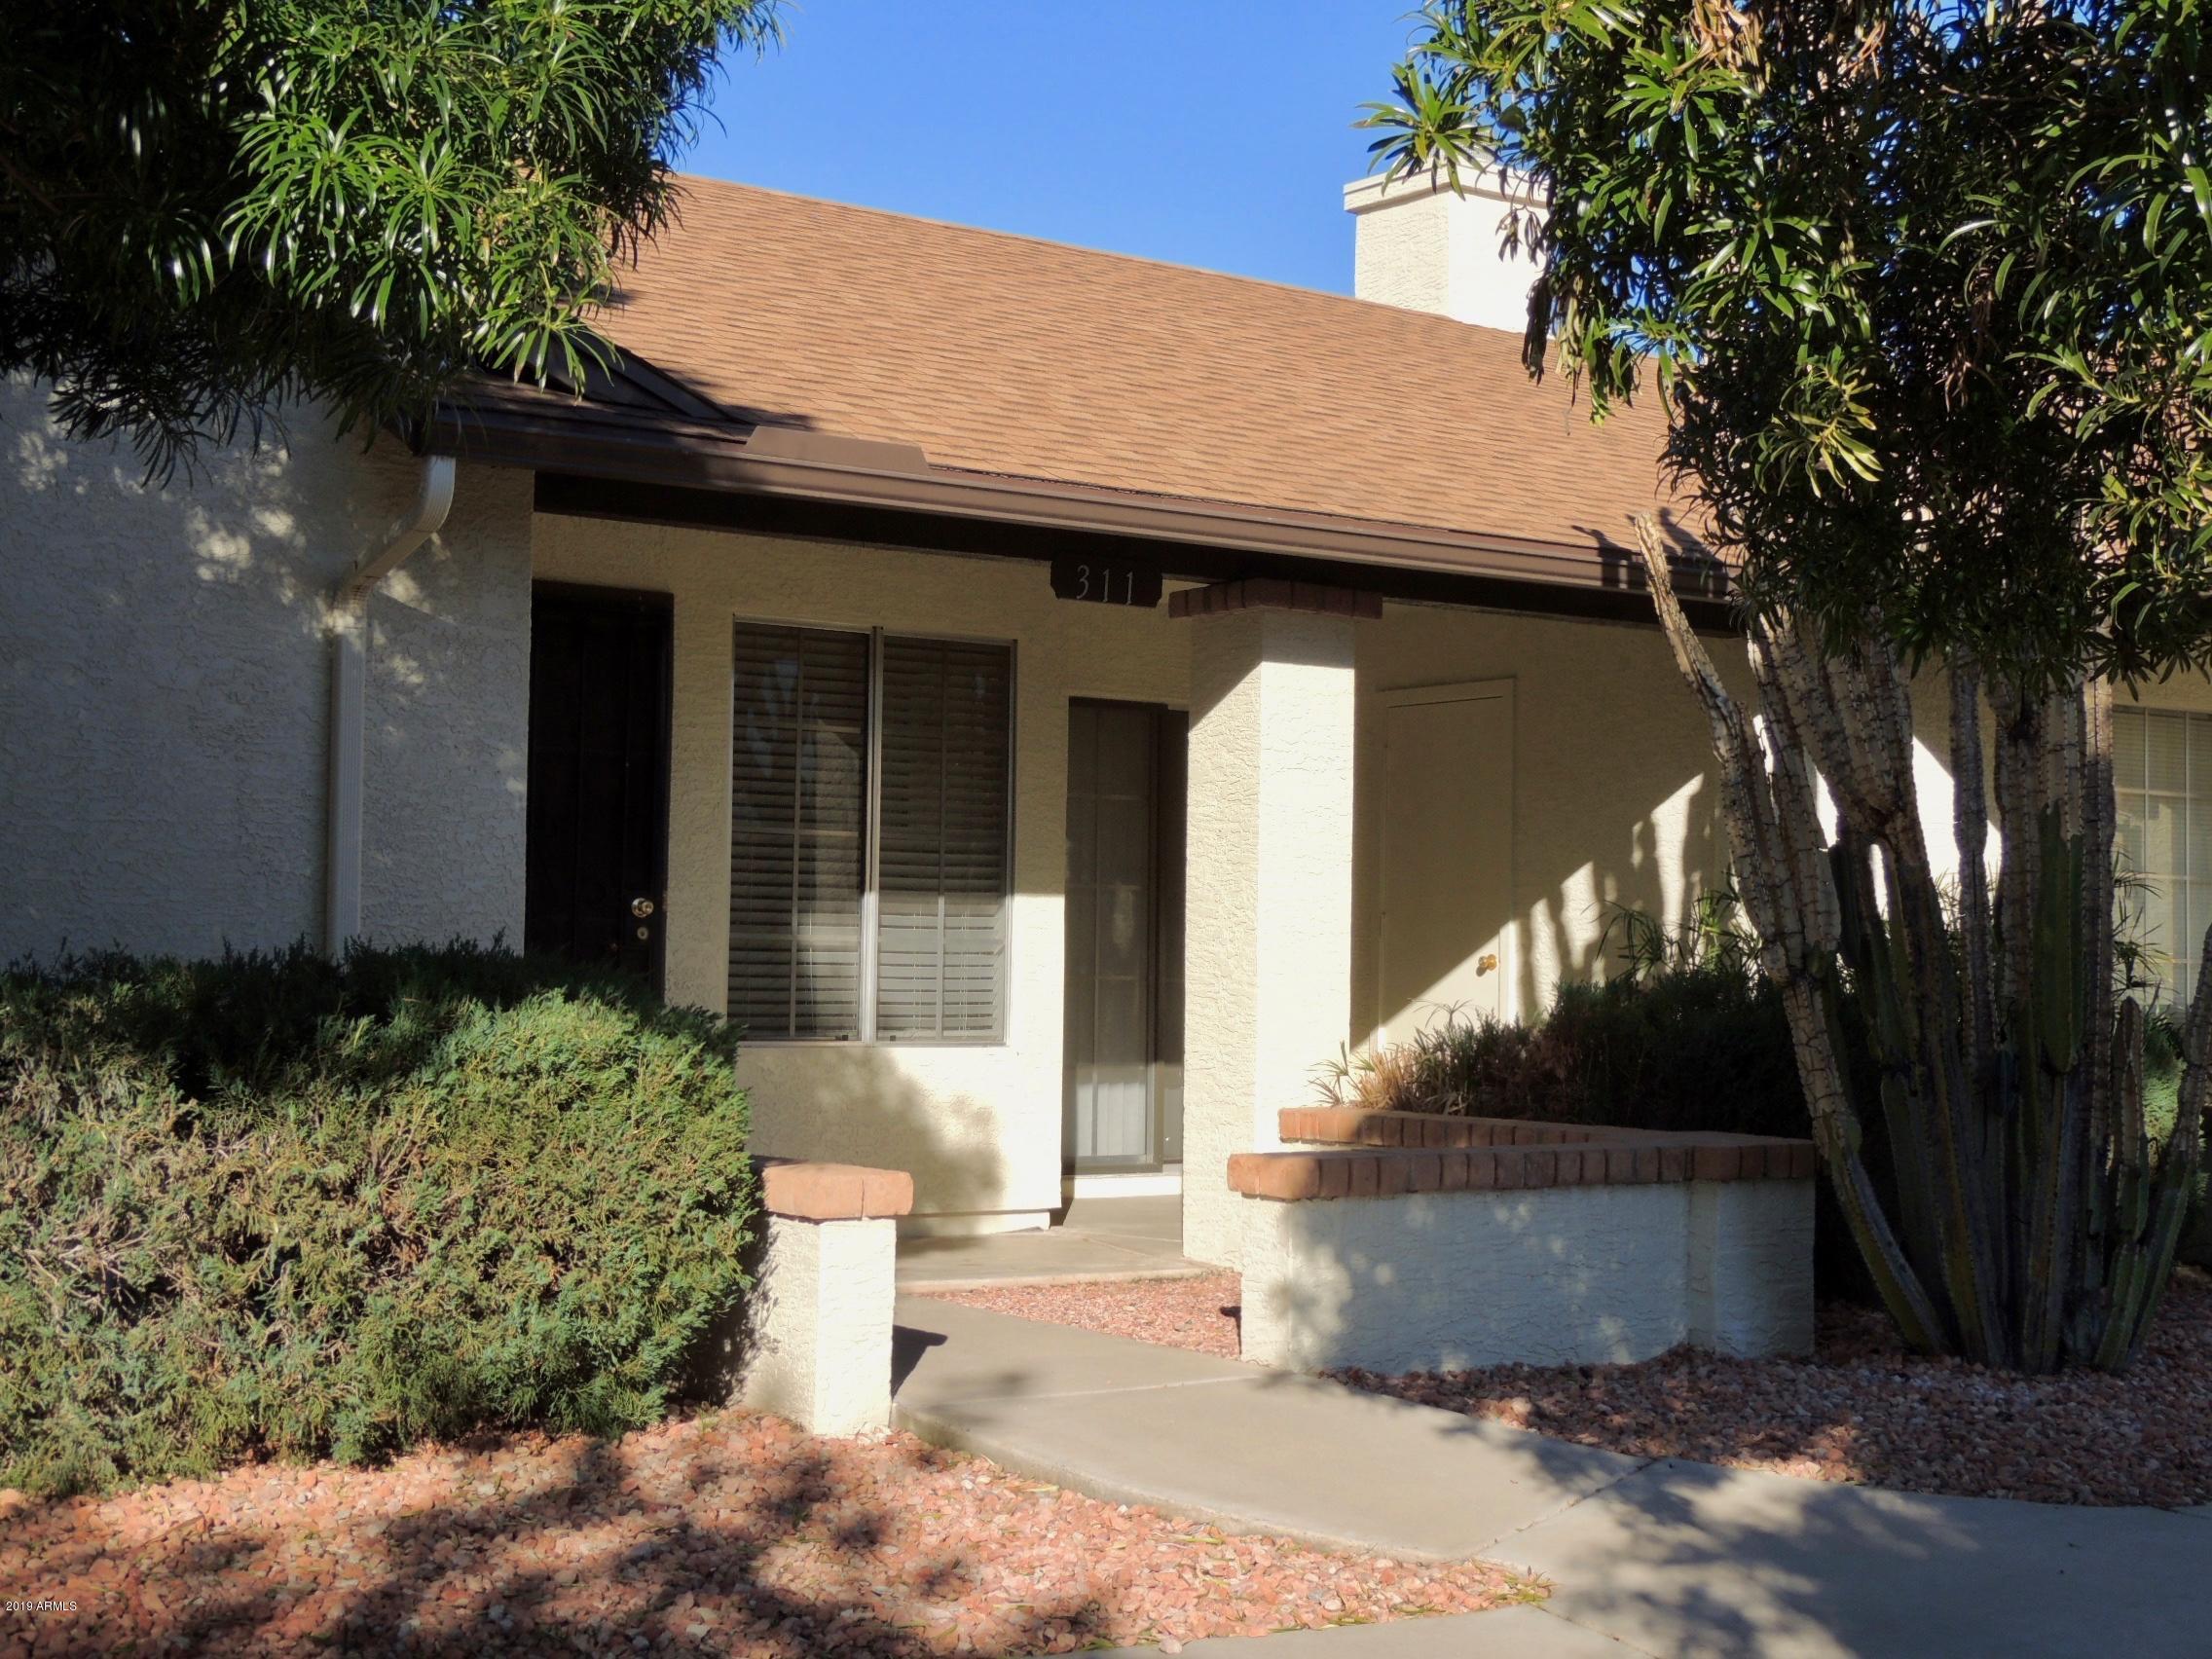 Photo of 8140 N 107TH Avenue #311, Peoria, AZ 85345